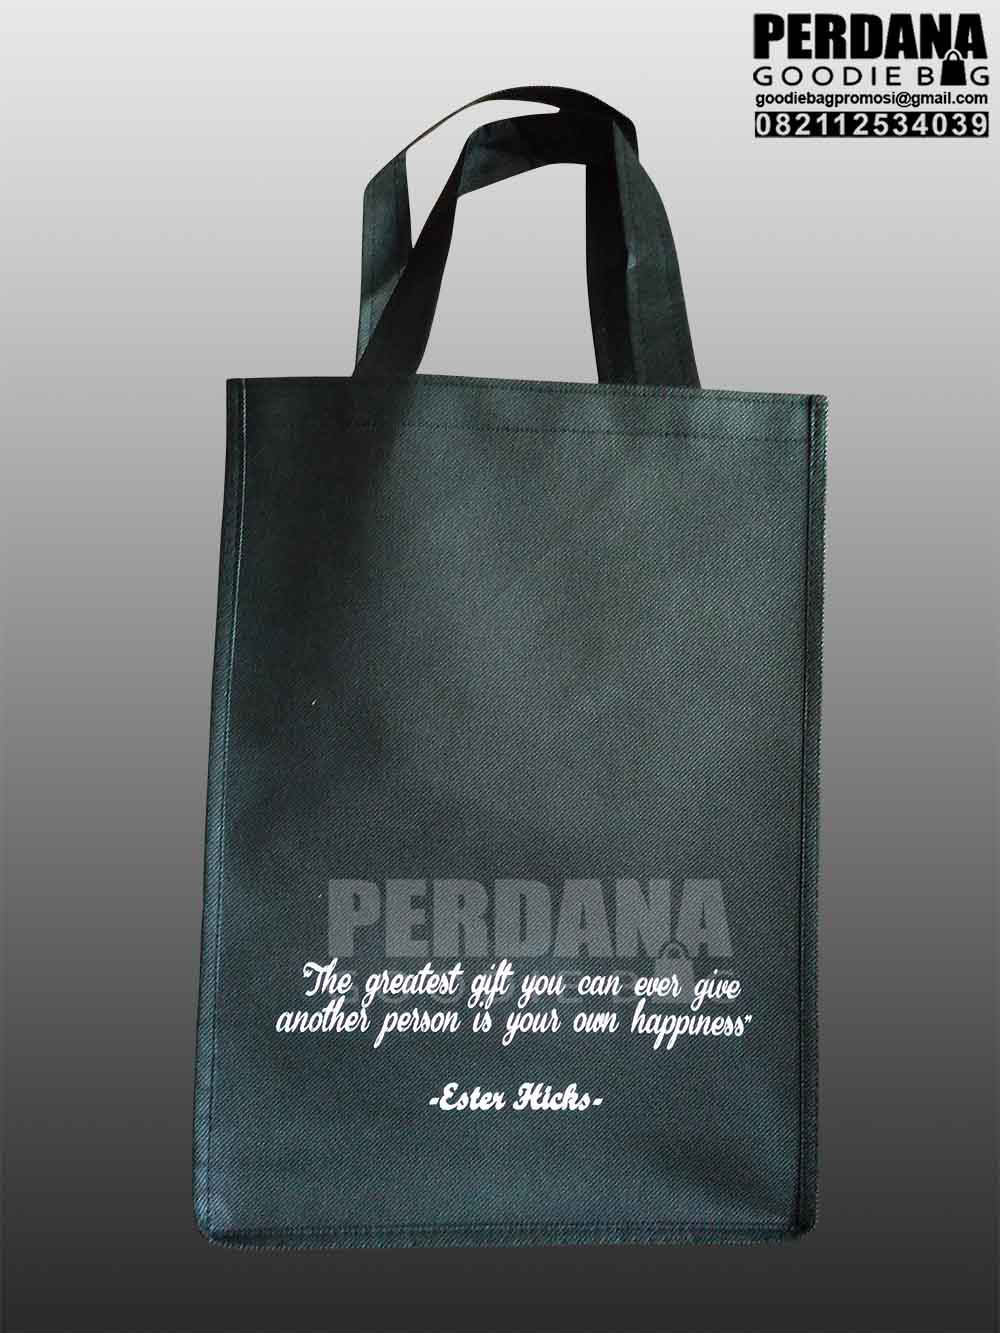 Goodie Bag Spunbond Gratika